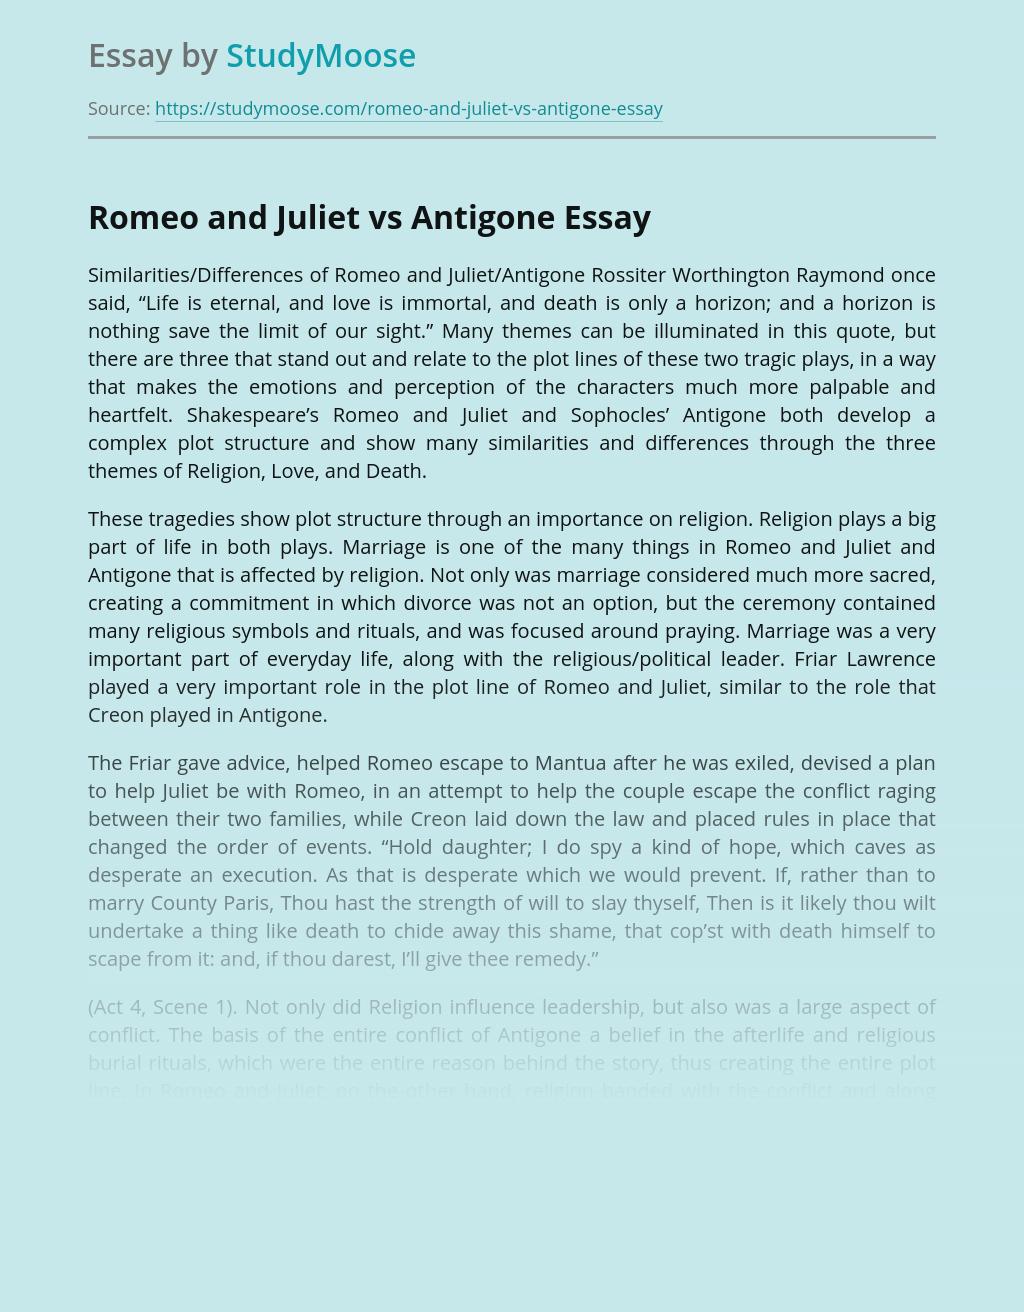 Romeo and Juliet vs Antigone